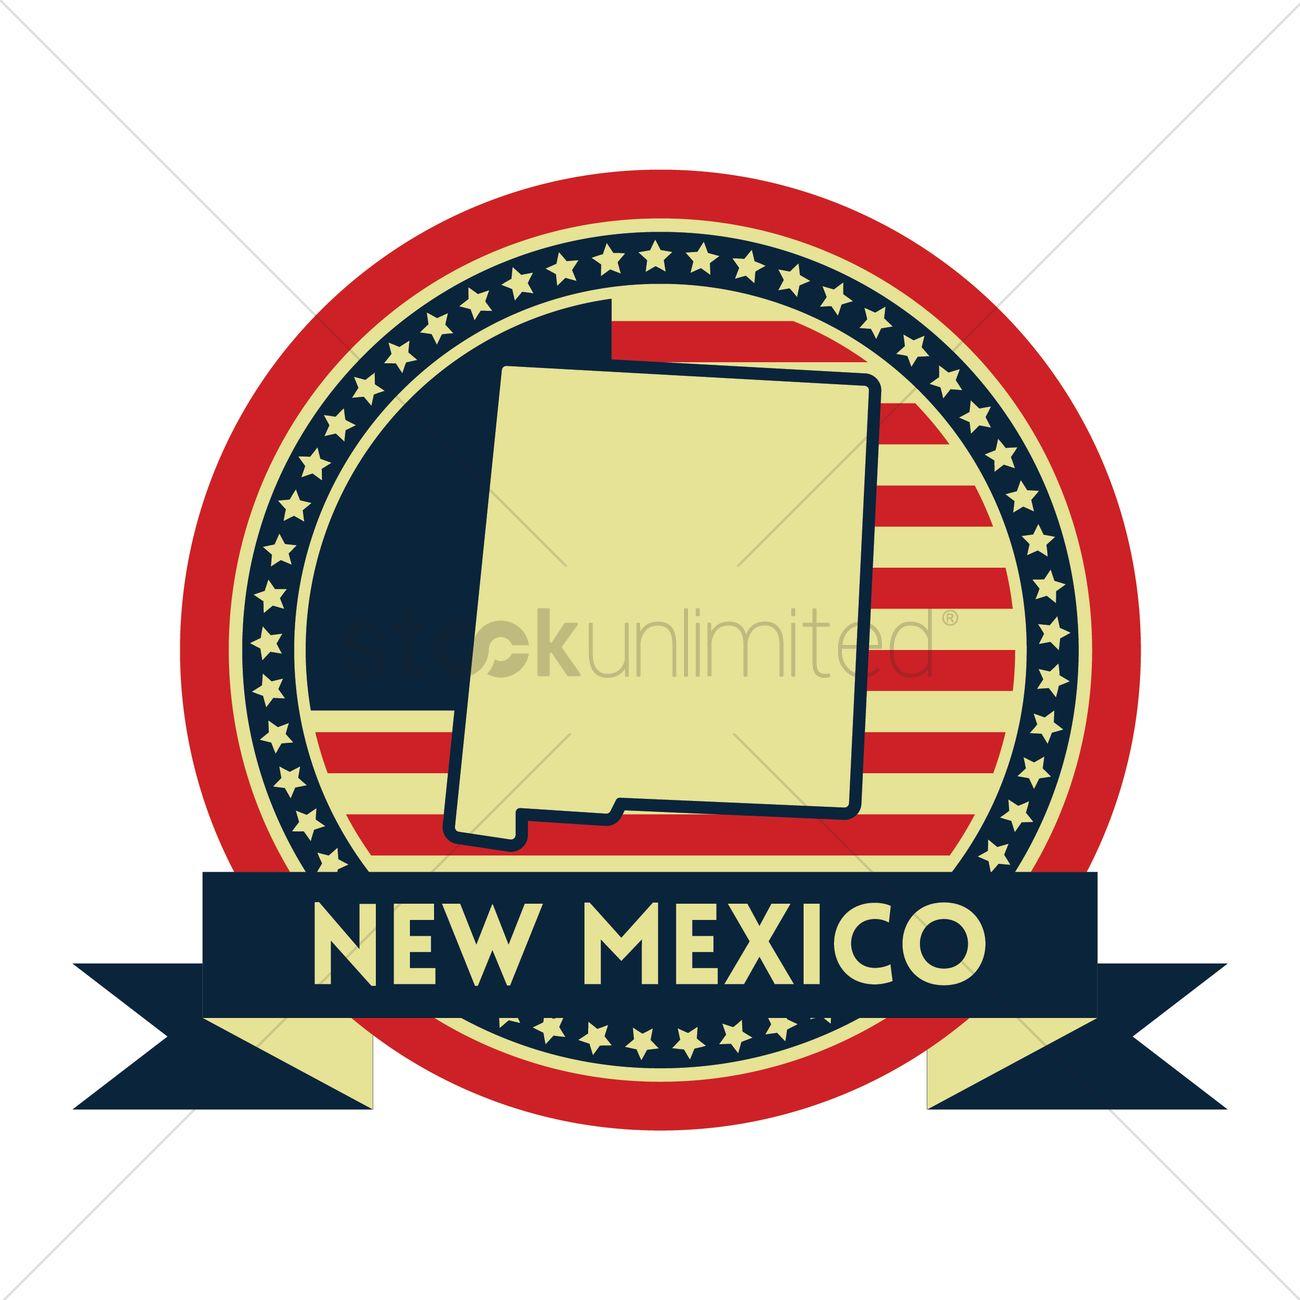 Free New Mexico Map.Free New Mexico Map Label Vector Image 1618437 Stockunlimited